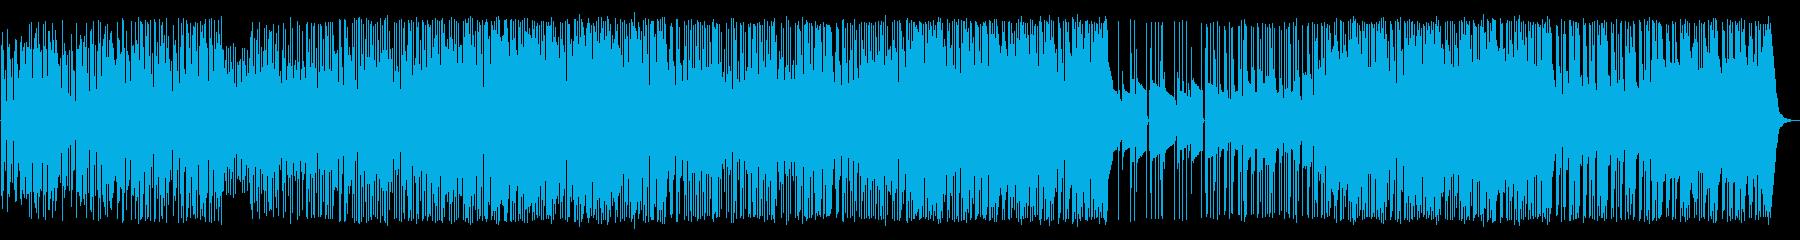 RPG洞窟/ホラー/DarkTypeの再生済みの波形